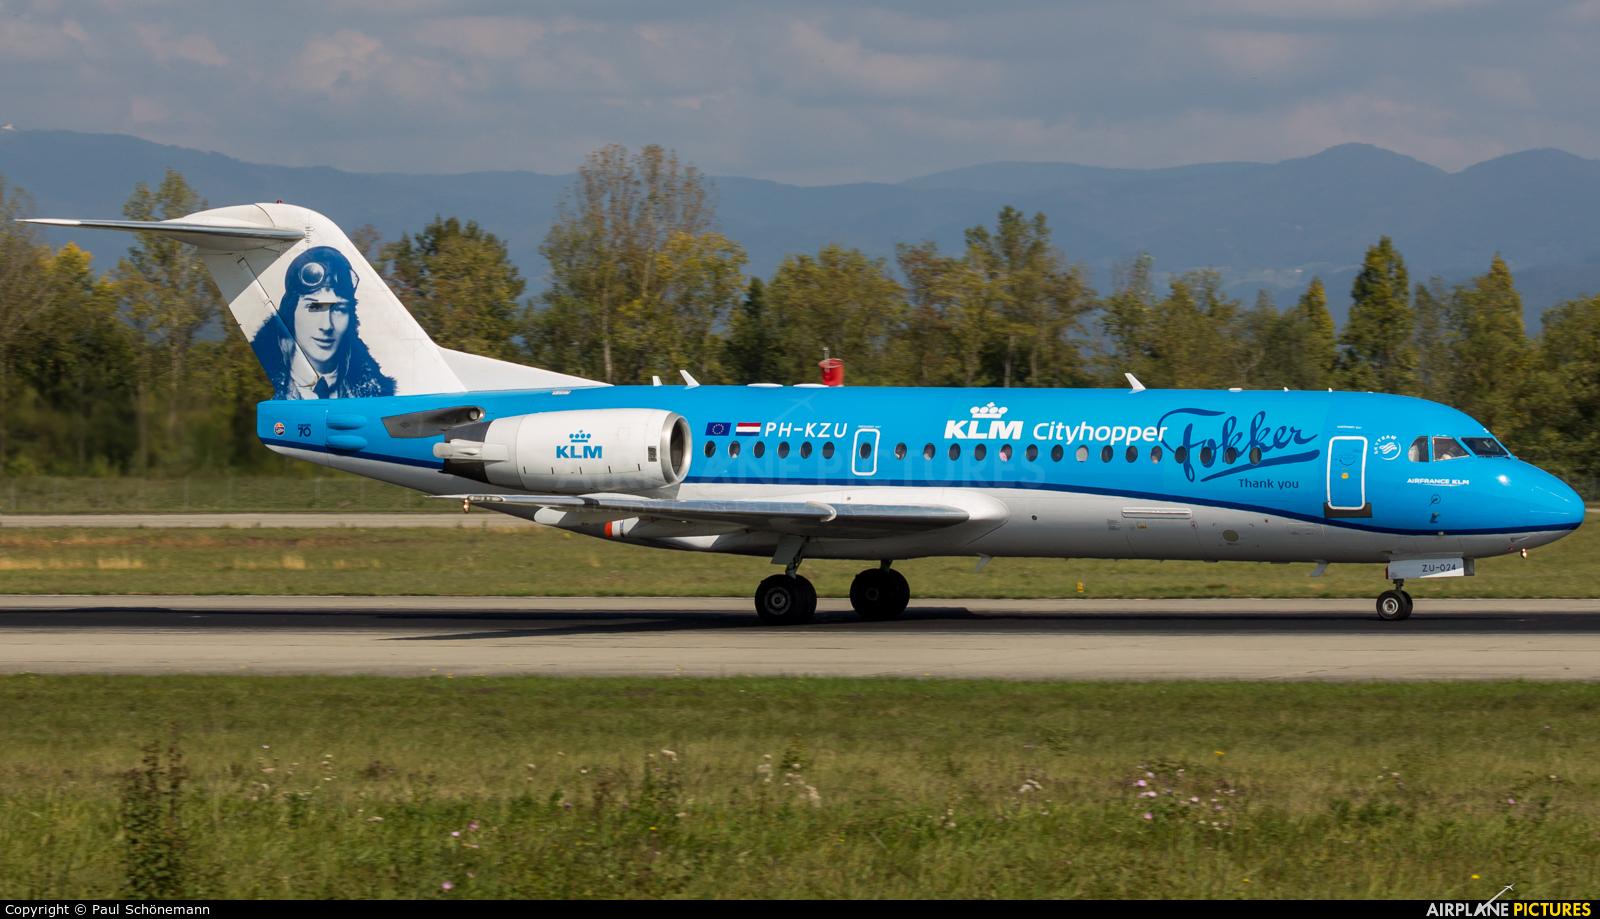 KLM Cityhopper PH-KZU aircraft at Basel - Mulhouse- Euro